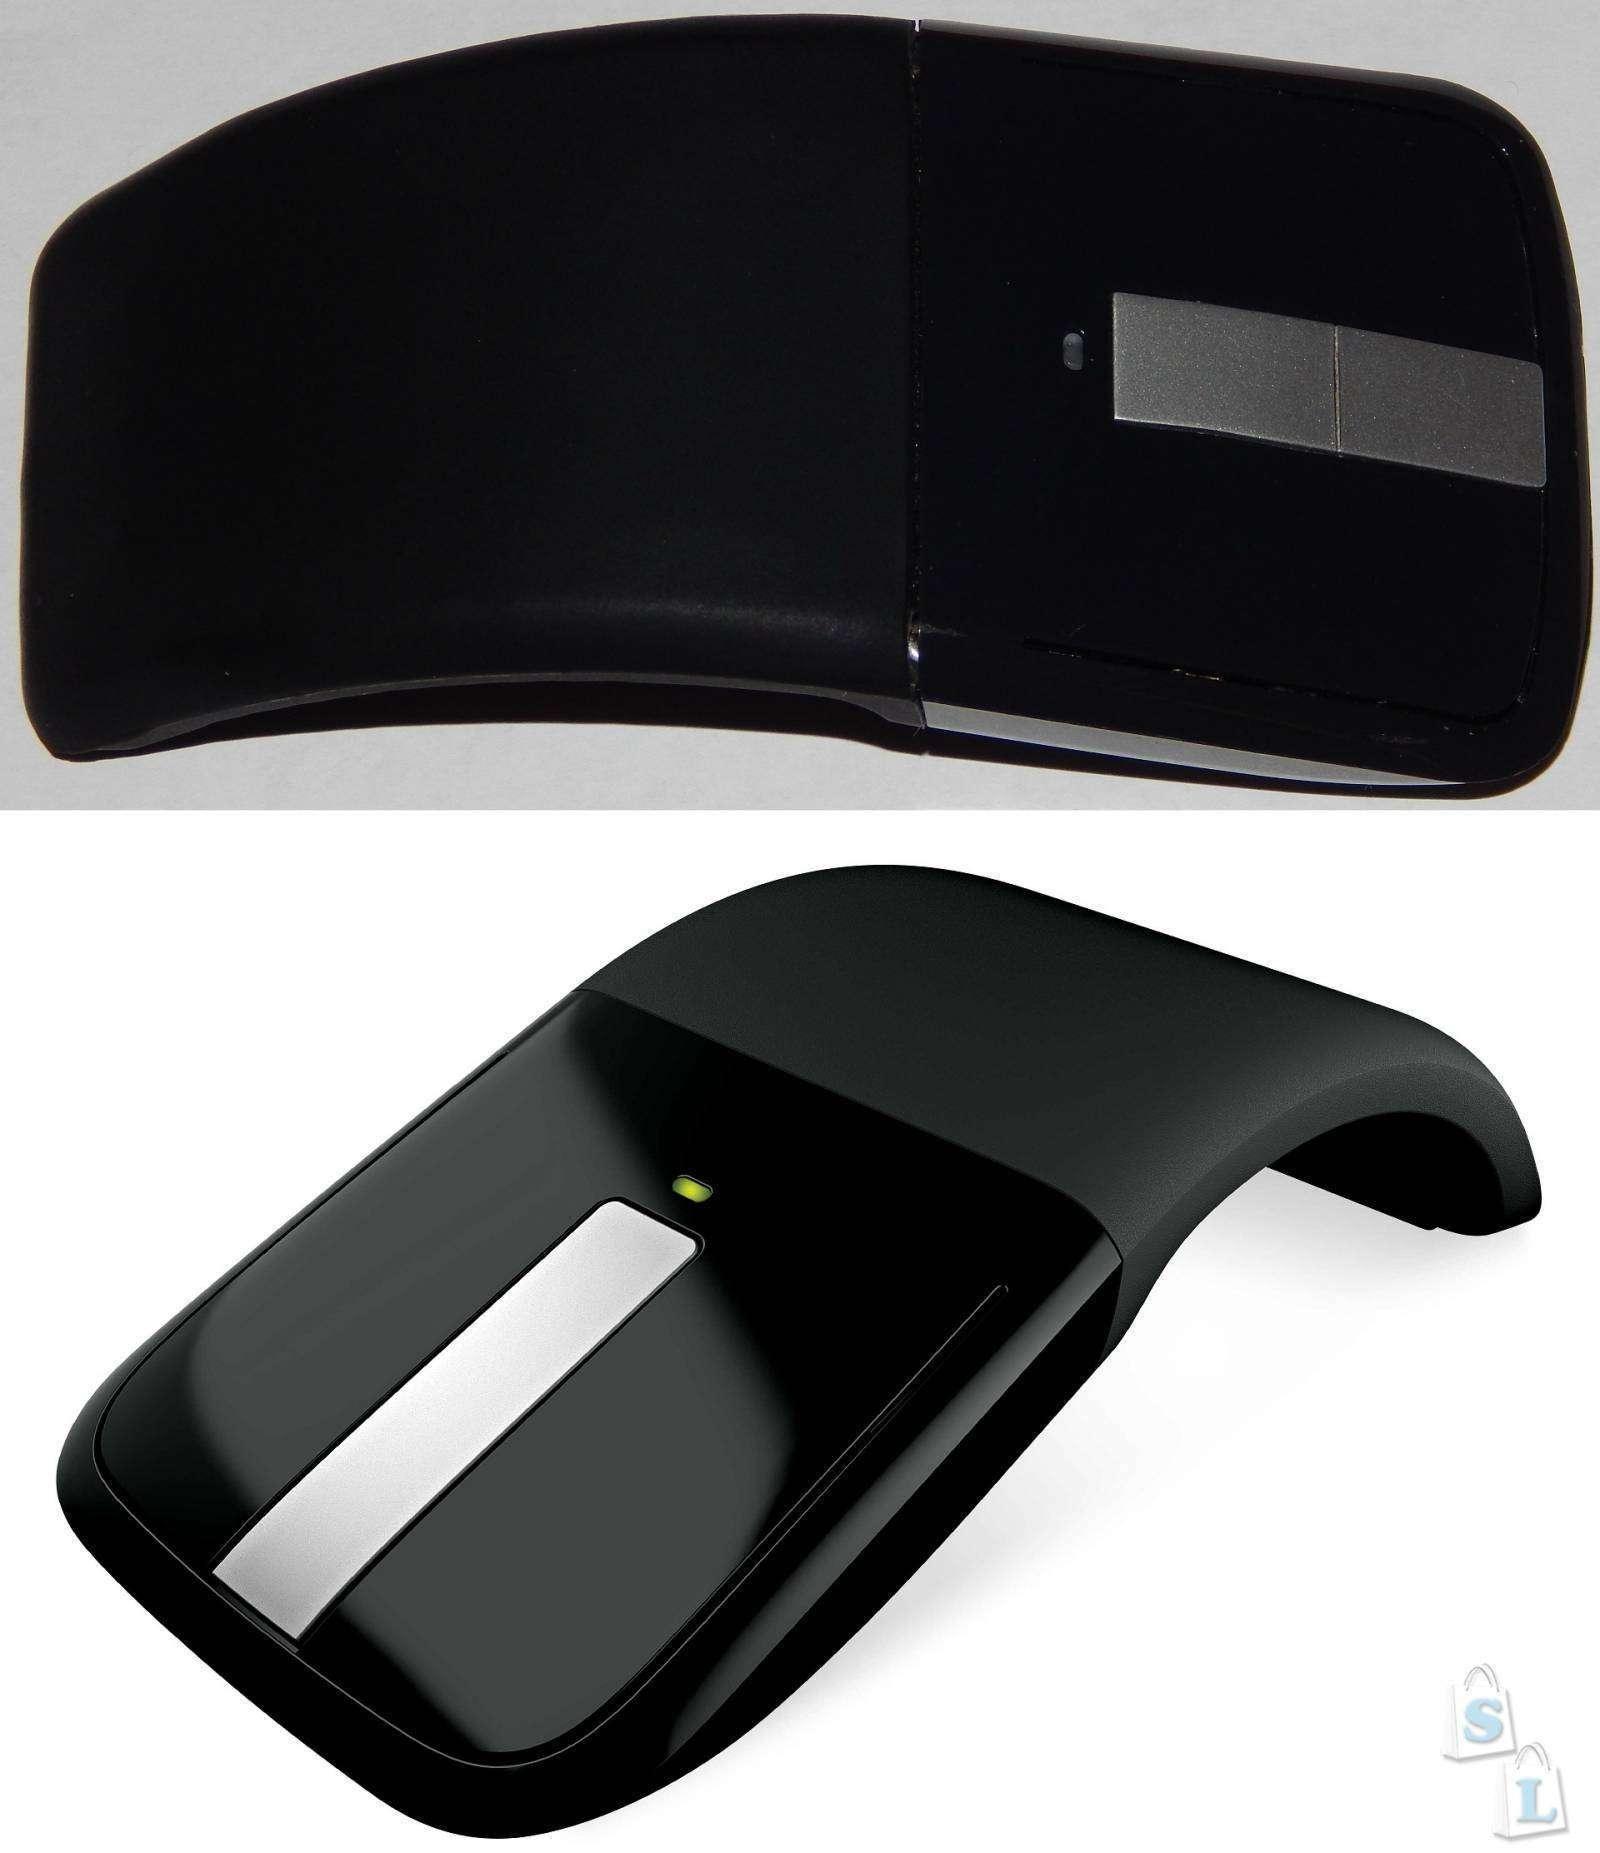 Aliexpress: Копия компьютерной мышки Microsoft Arc Touch Mouse